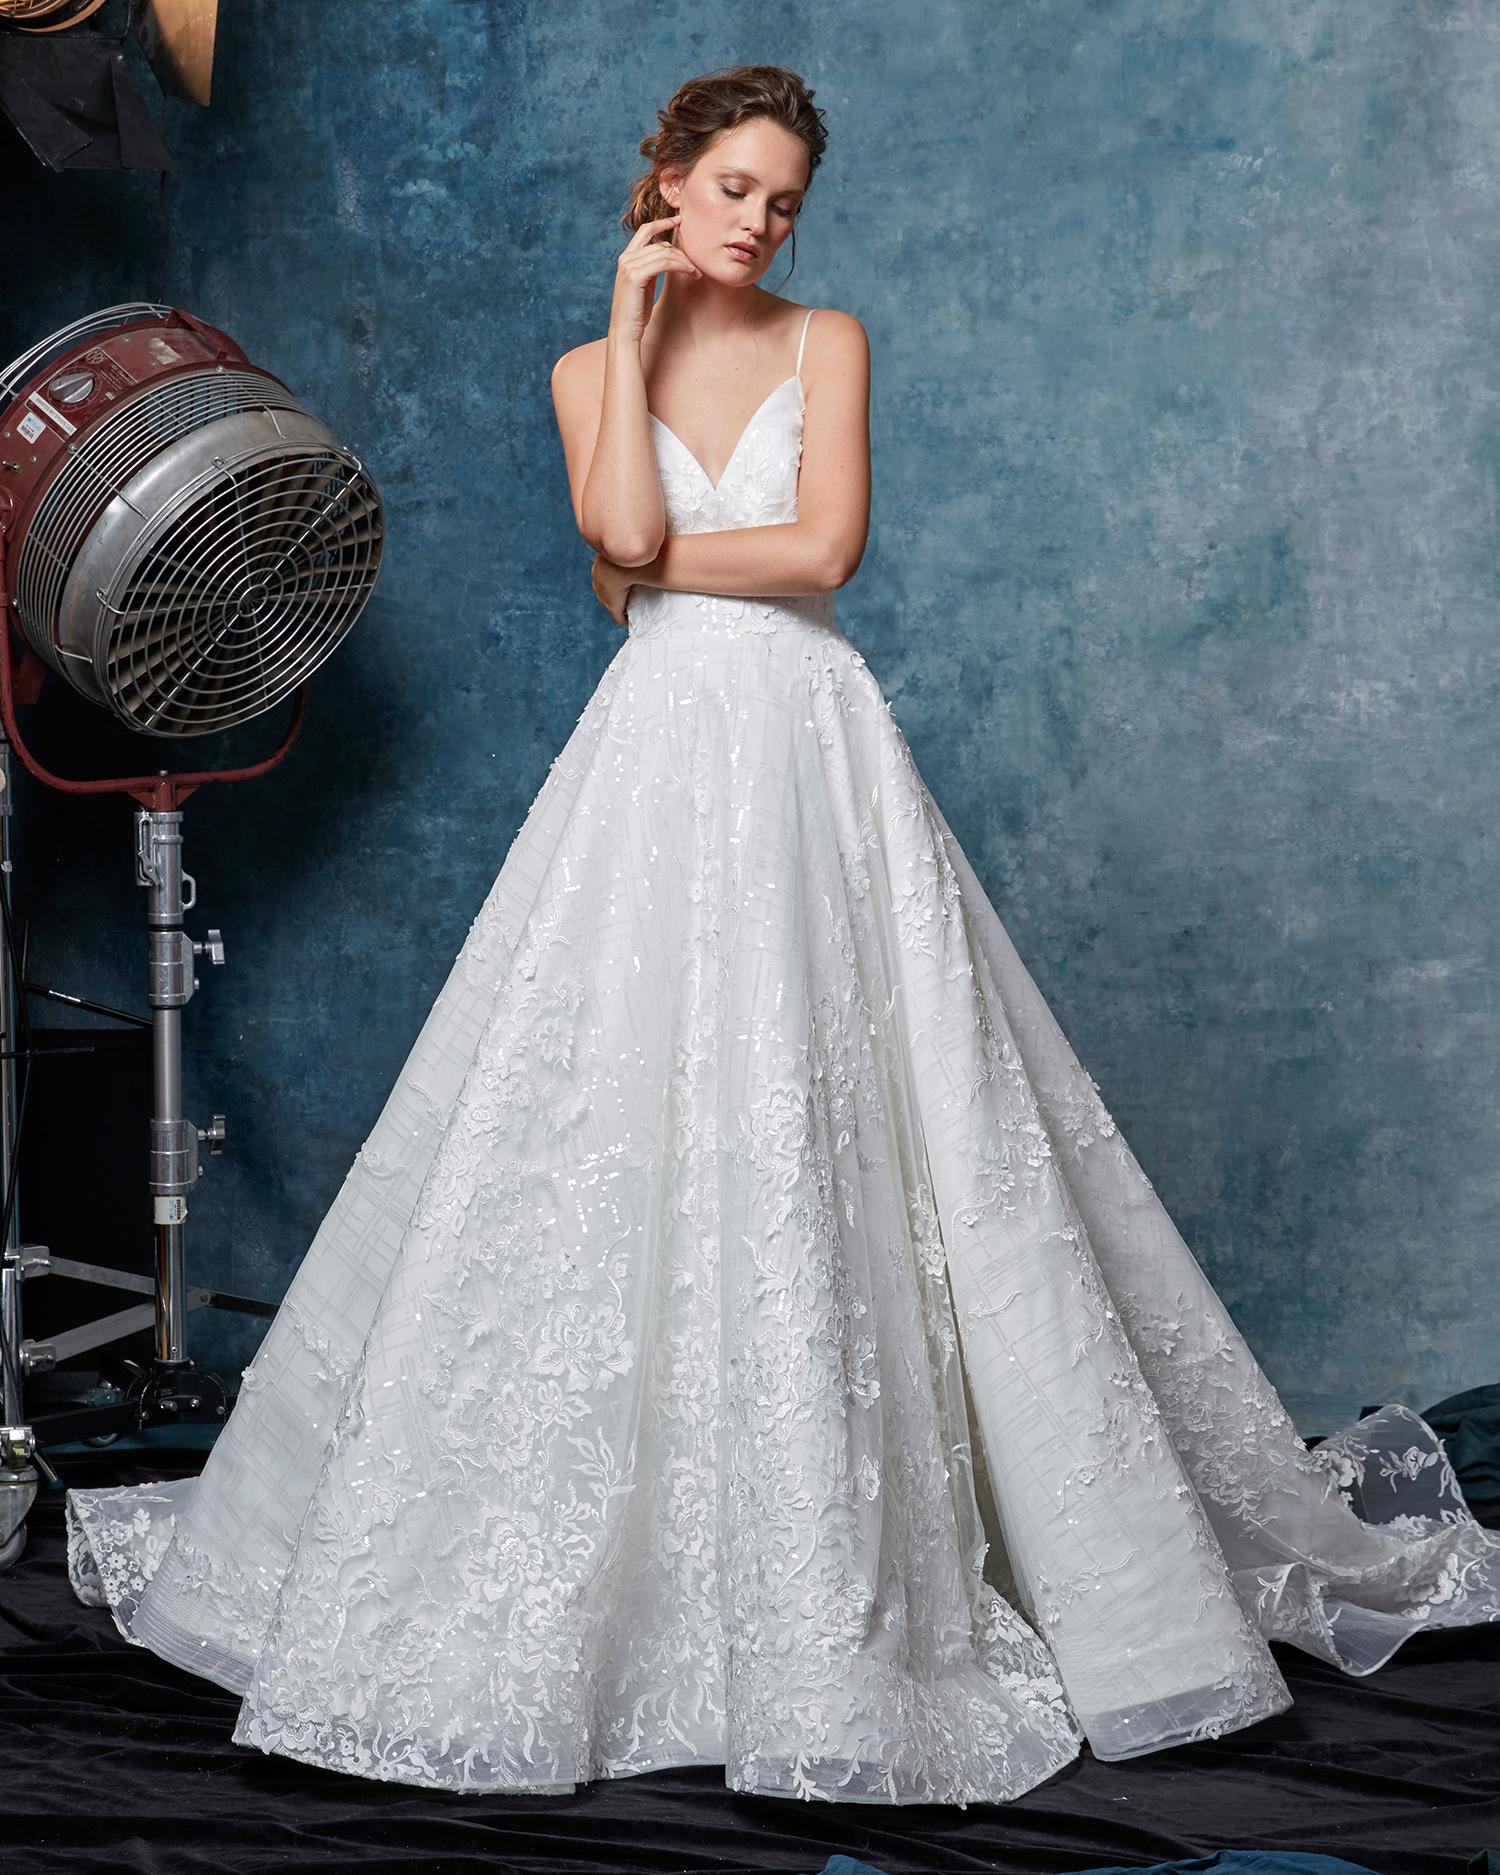 sareh nouri dress fall 2019 spaghetti strap ball gown with beadwork